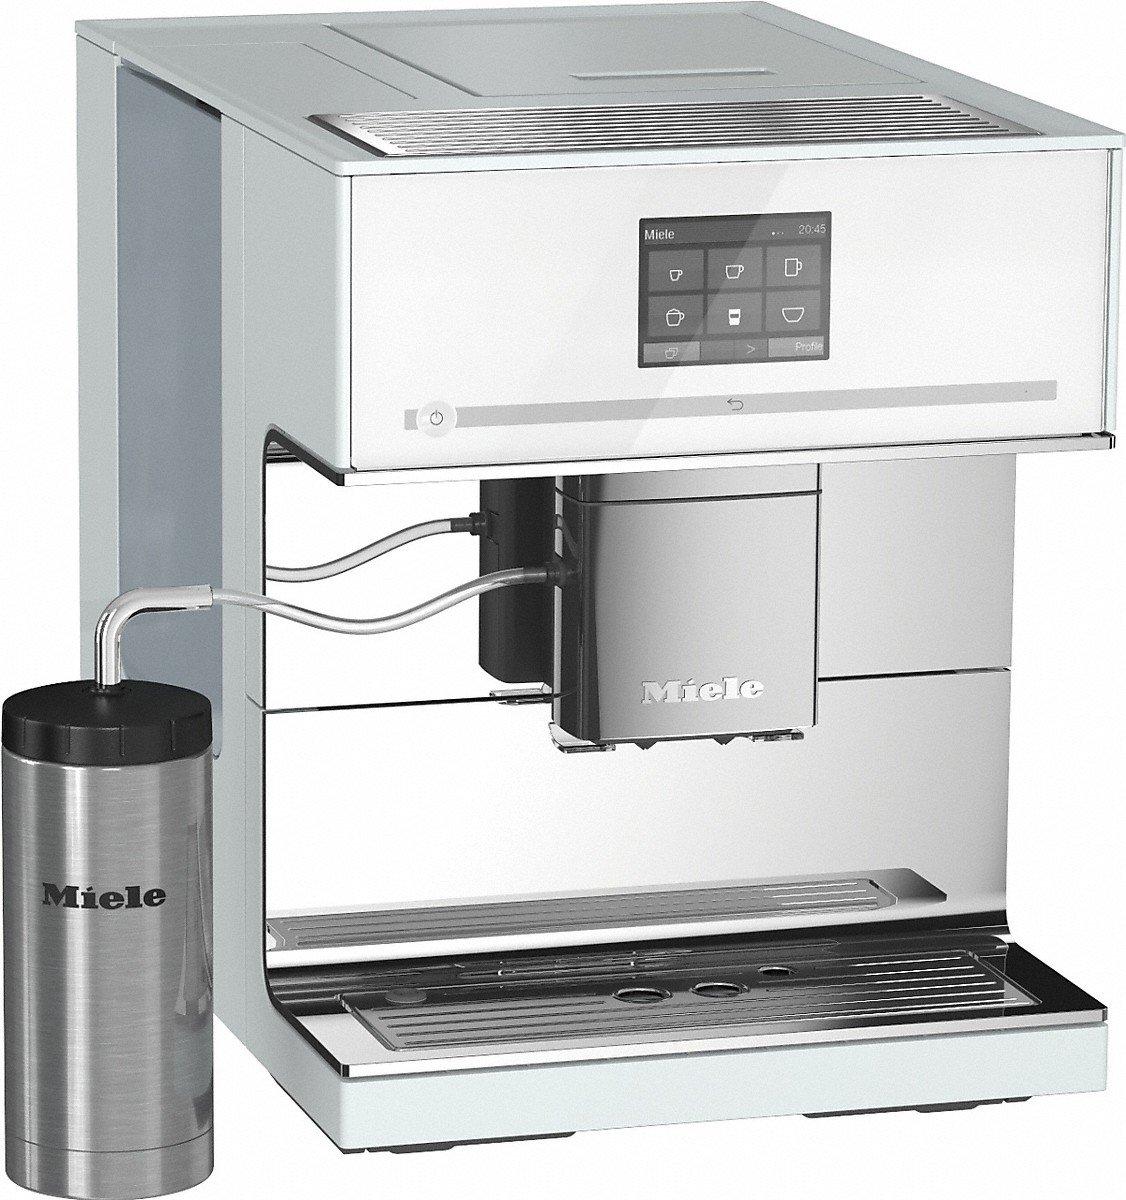 Miele-10262120-Heigetrnk-Vollautomaten-CM7500-D-BRWSparent